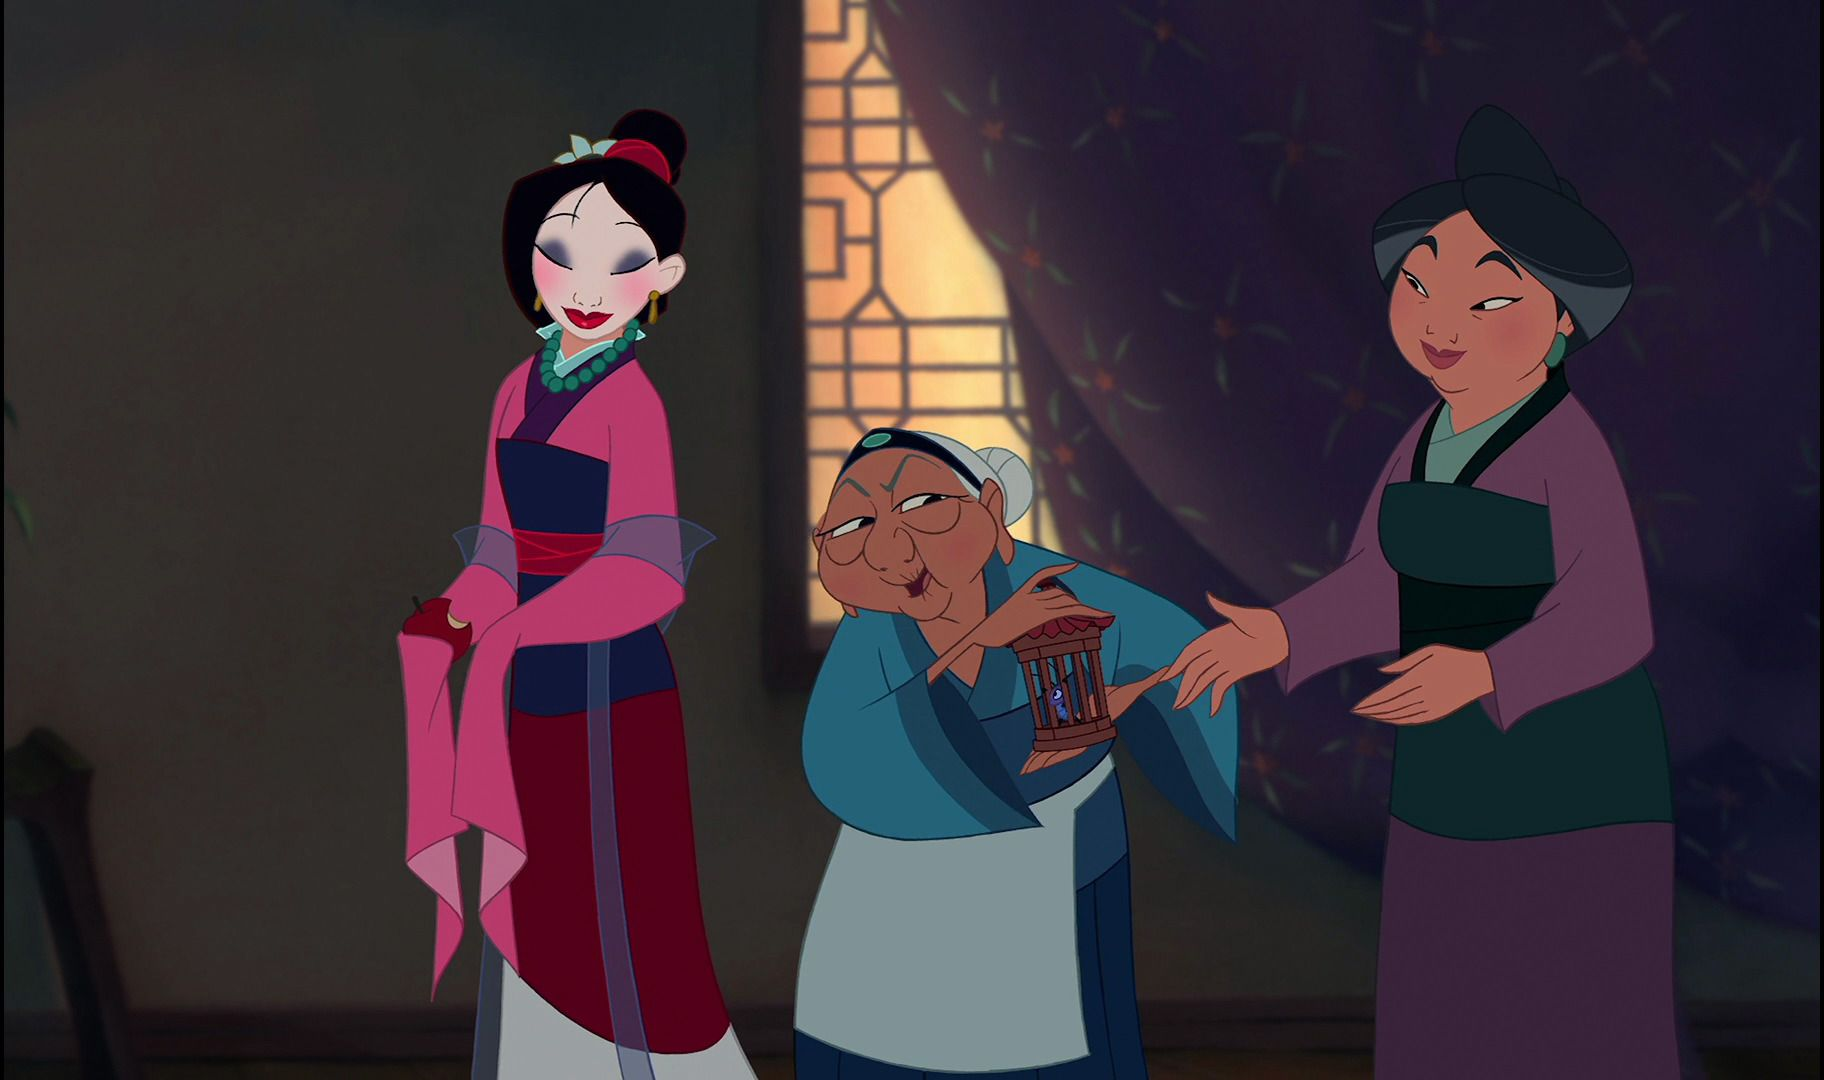 Mulan (1998) (With images) Disney pixar characters, Mulan